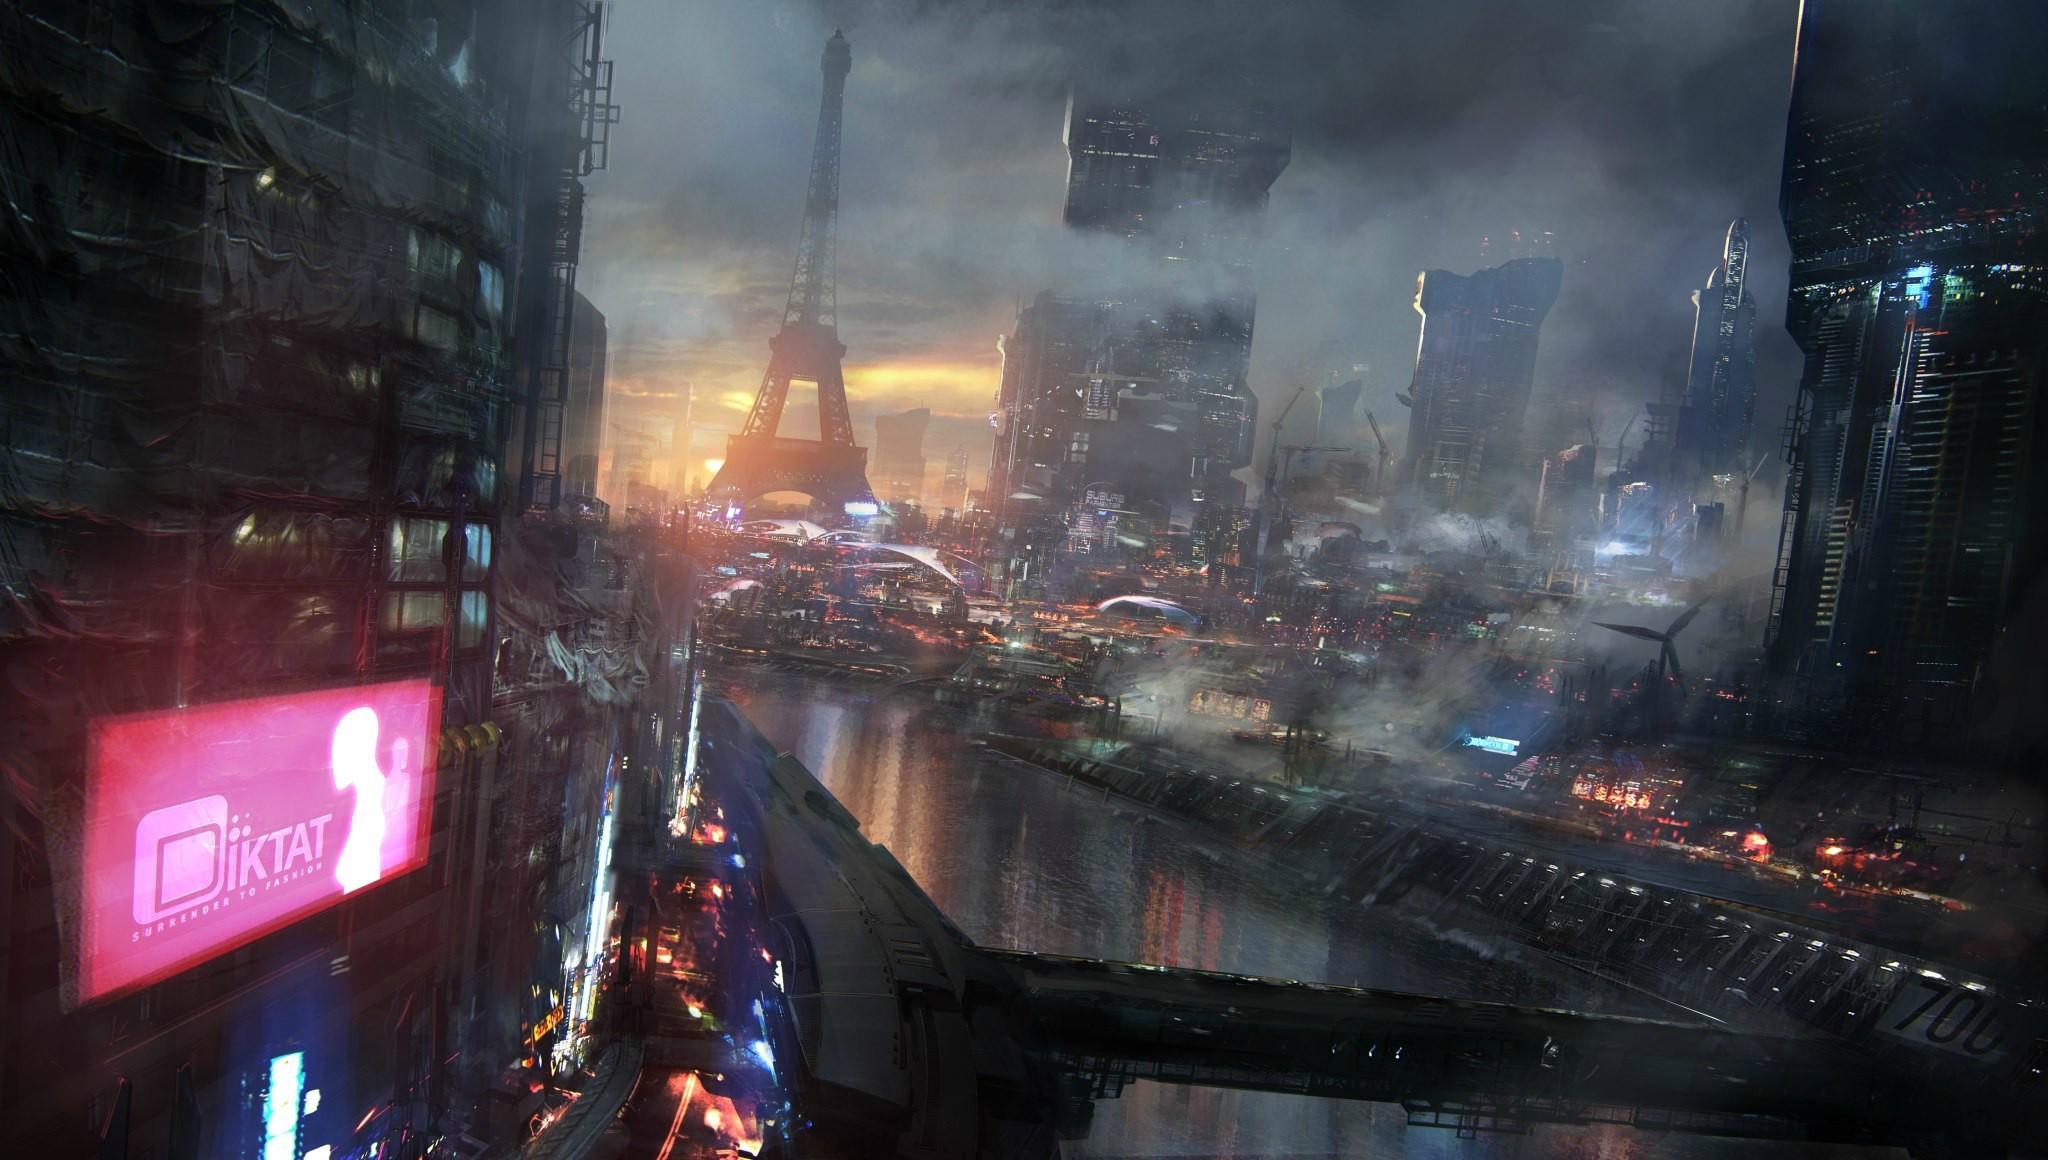 General 2048x1160 cyberpunk futuristic futuristic city science fiction artwork city cityscape Paris Remember Me video games Eiffel Tower PC gaming video game art